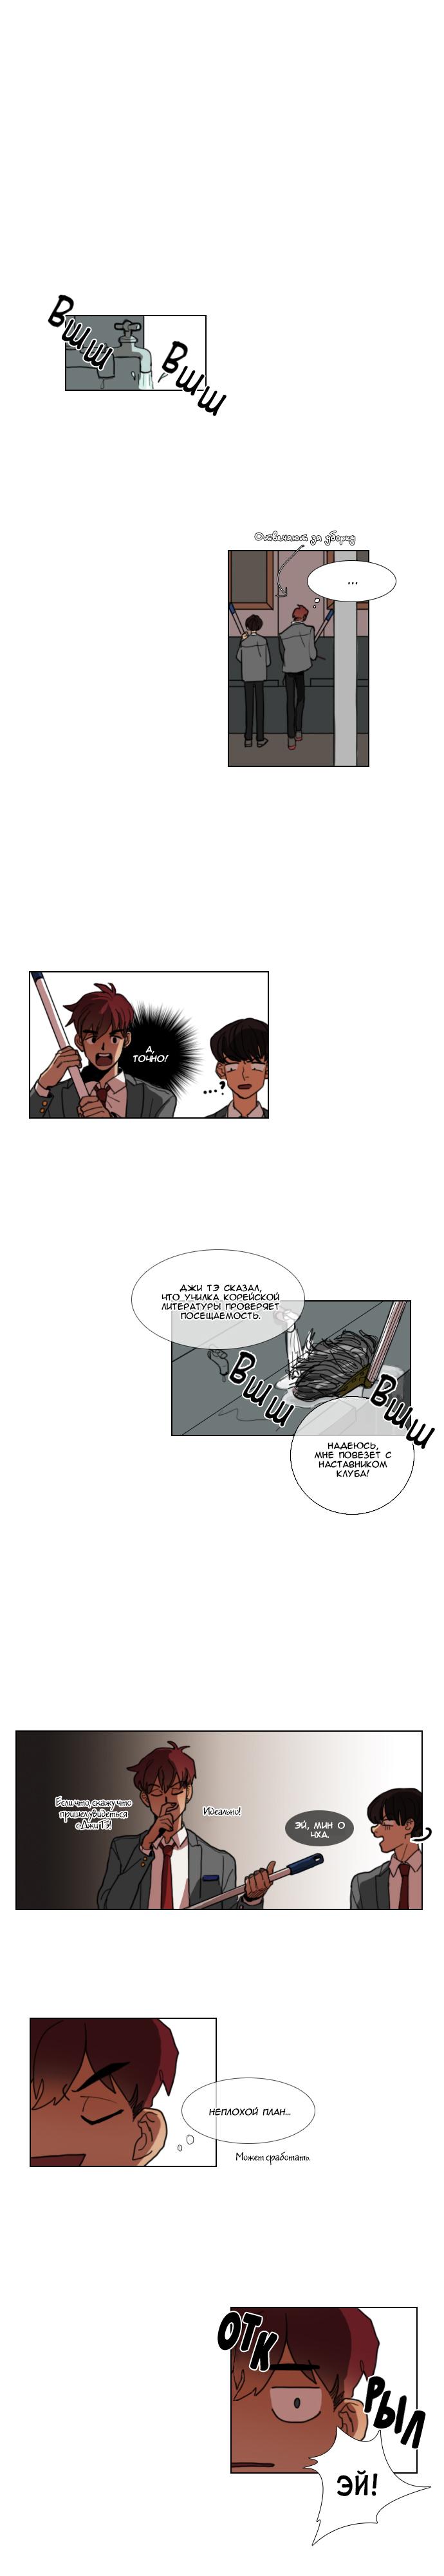 https://r1.ninemanga.com/comics/pic2/27/31131/325920/1496560539661.jpg Page 3